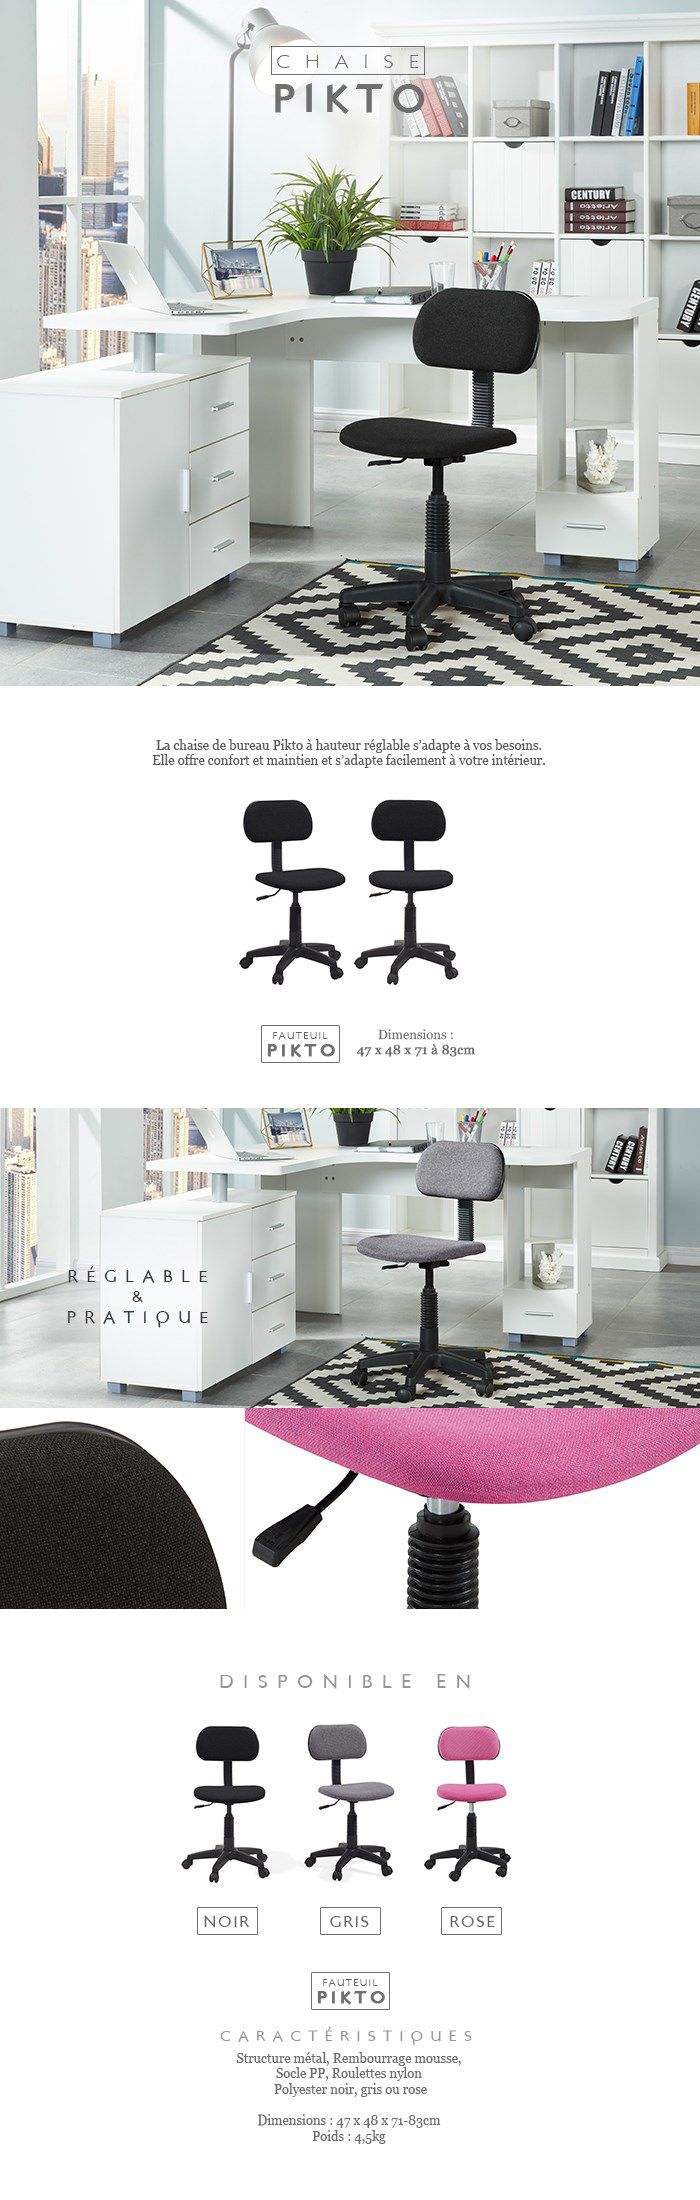 pikto chaise de bureau dactylo - tissu rose - l 38 x p 40 cm - achat